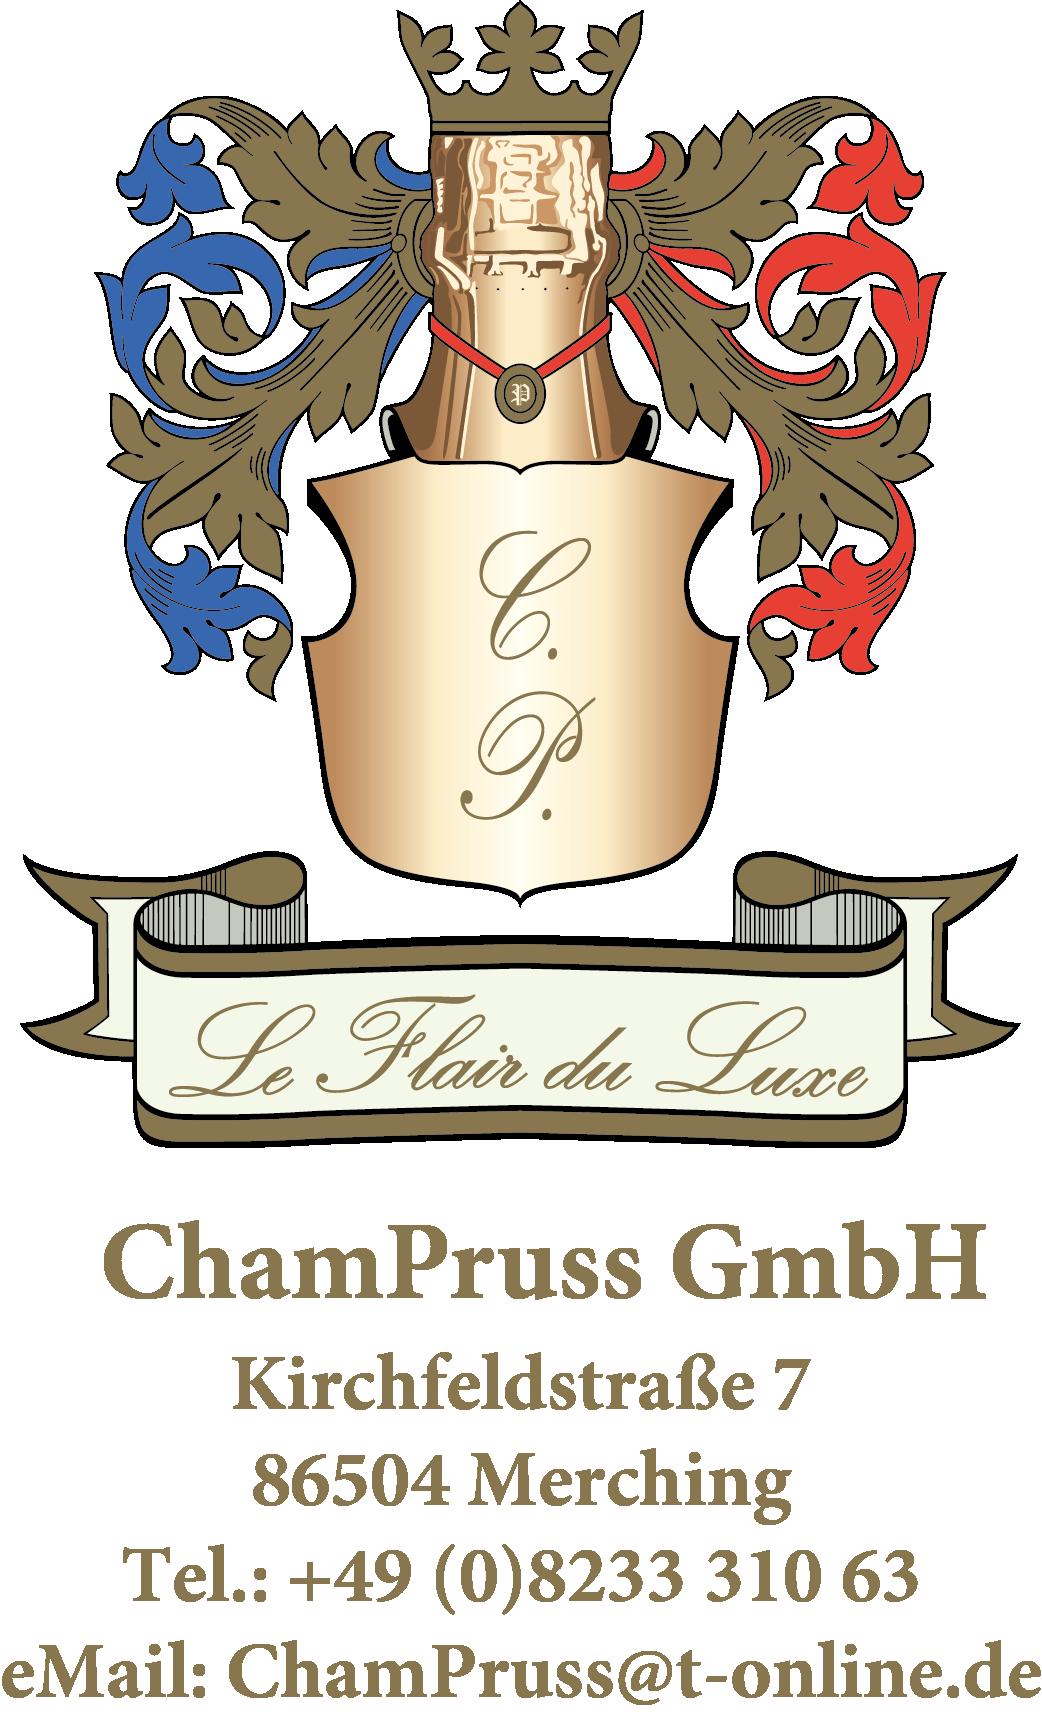 ChamPruss